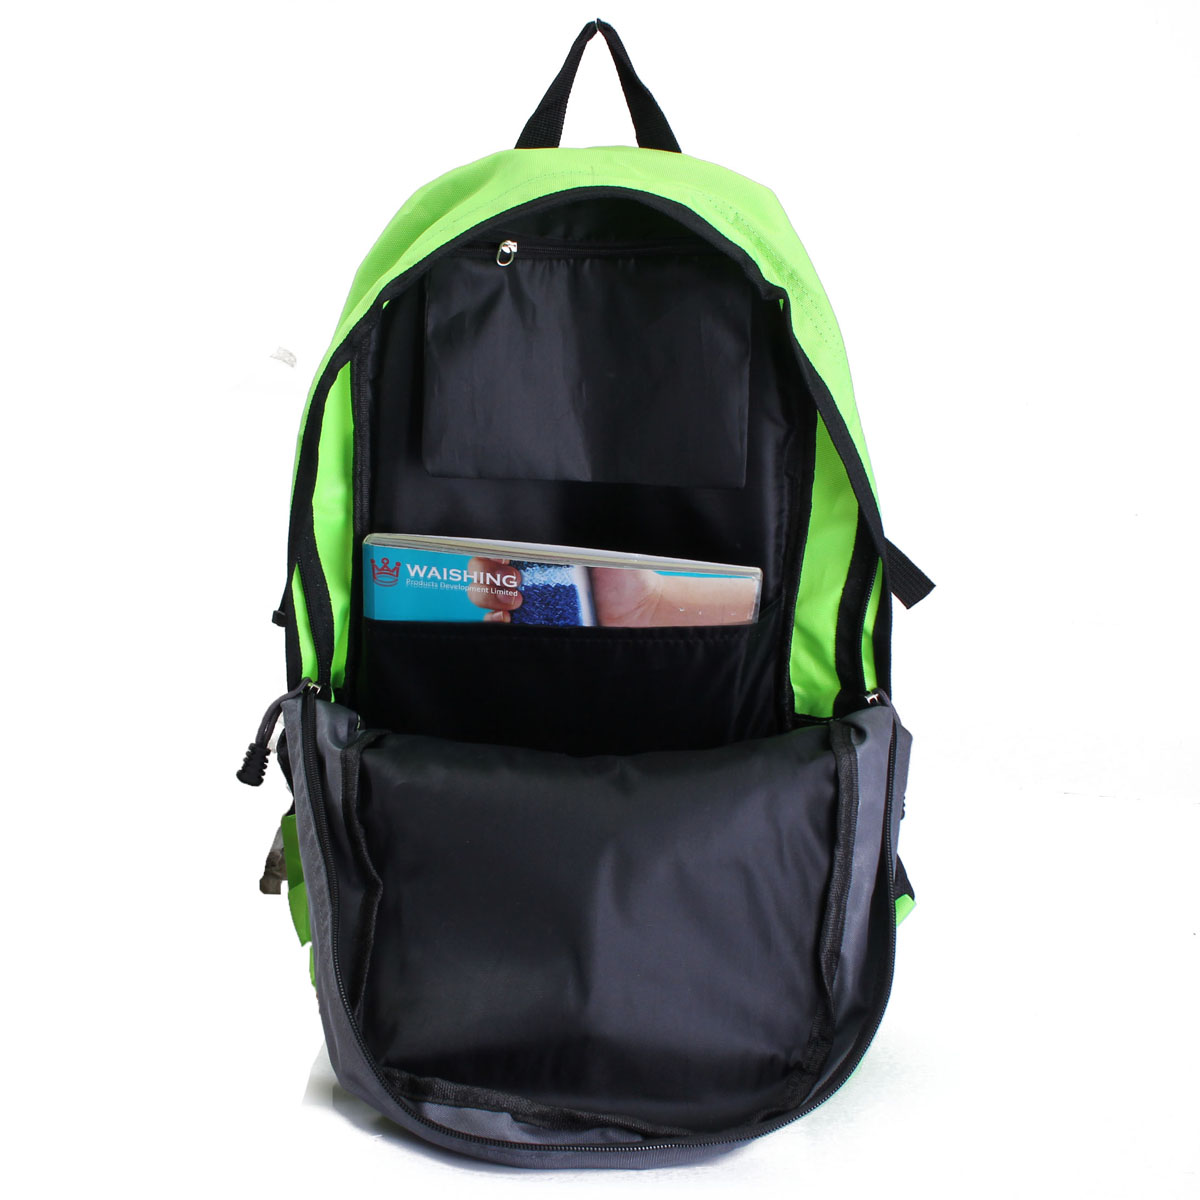 Durable Backpacks For Travel - Crazy Backpacks